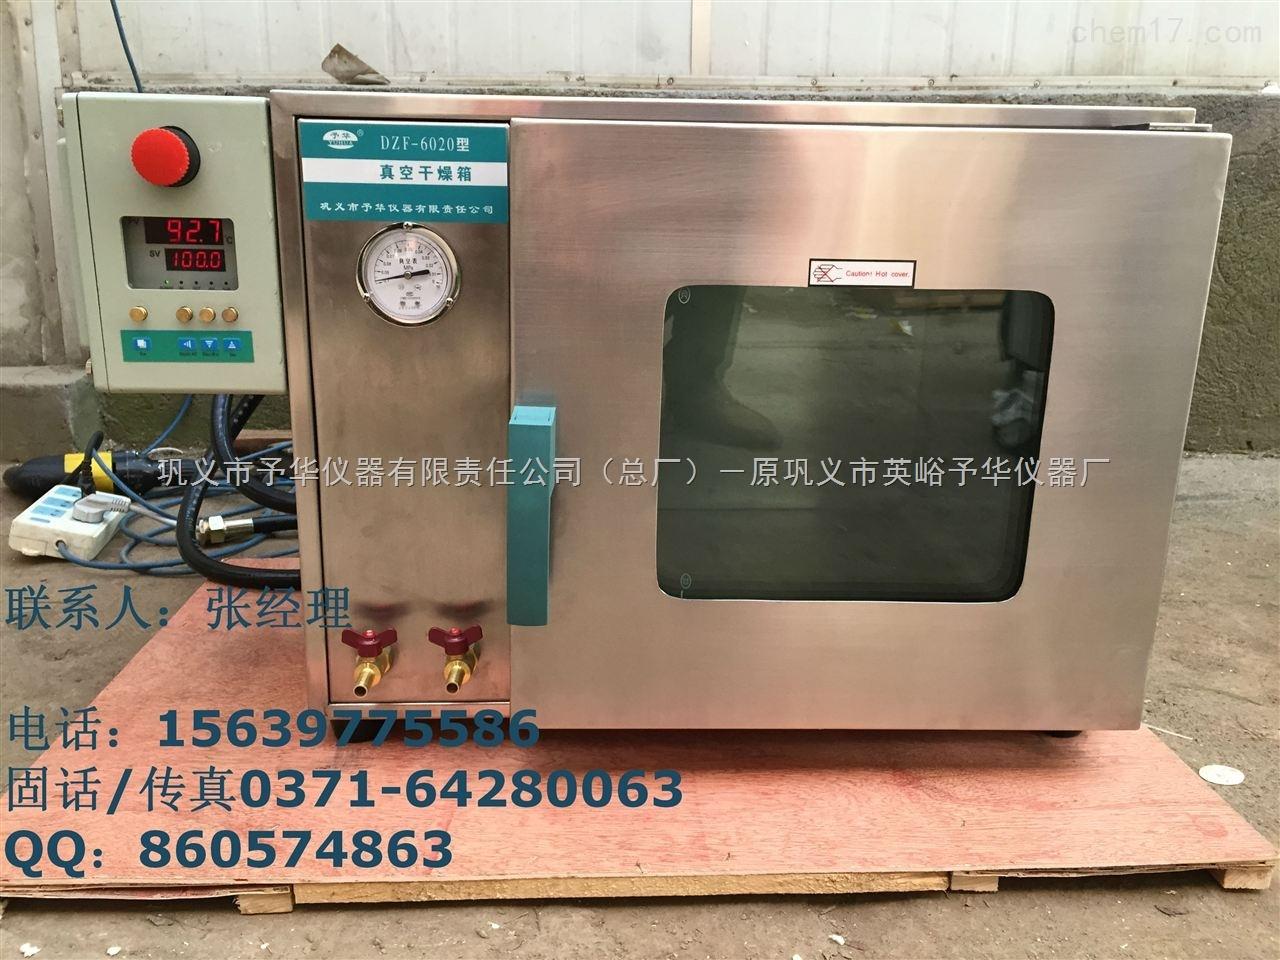 DZF-6020真空干燥箱低价抢购中